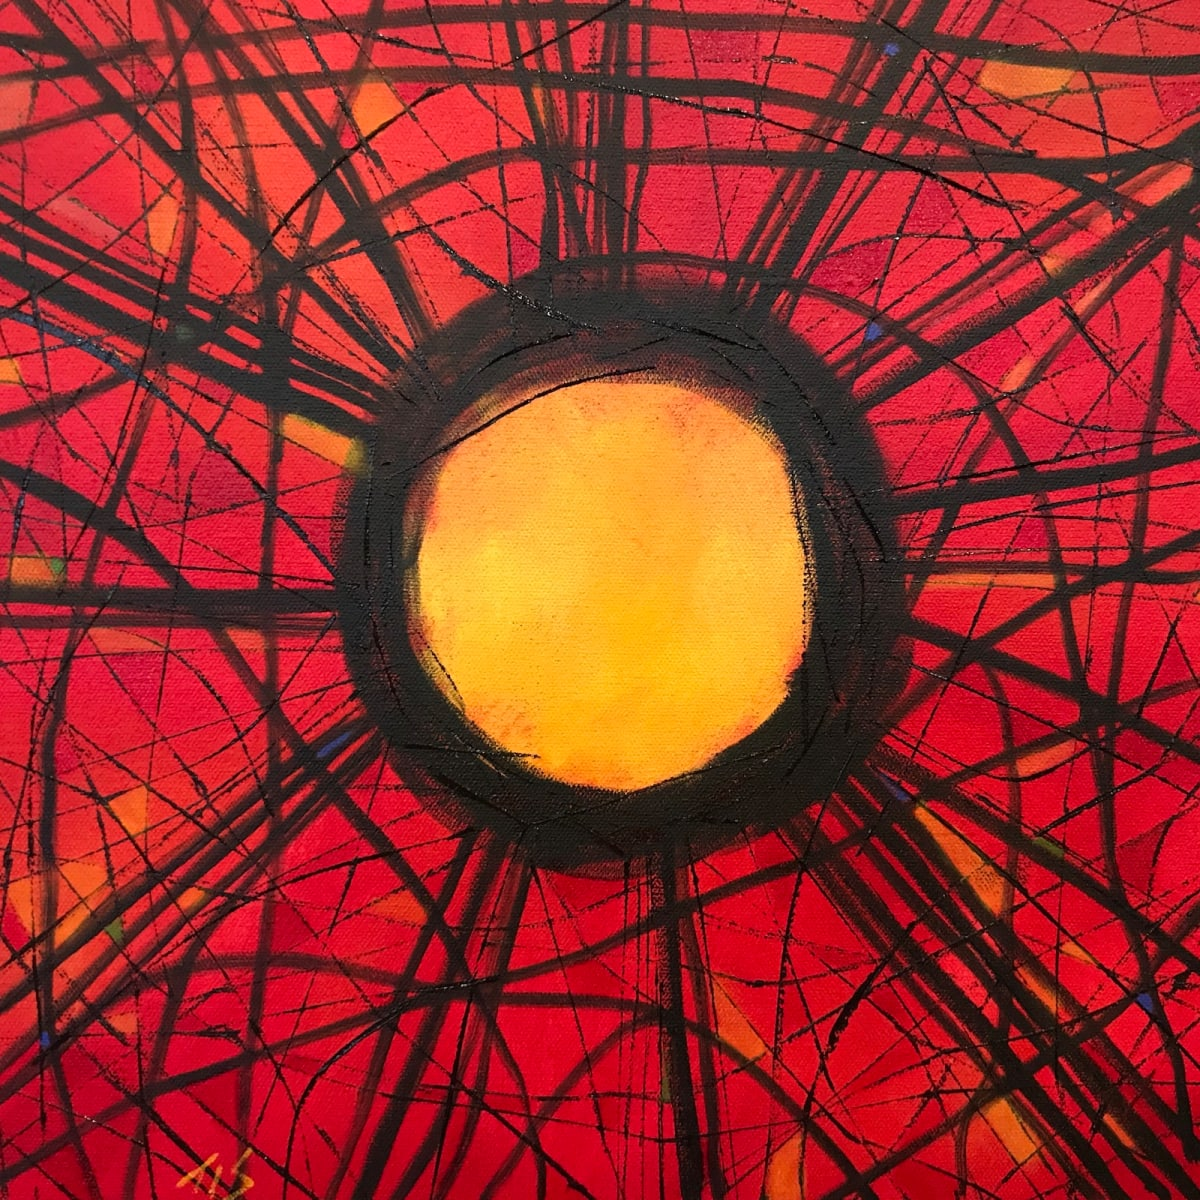 Stickwork Oculus (Scarlet)  36.072486N 79.101936W by Thomas Stevens